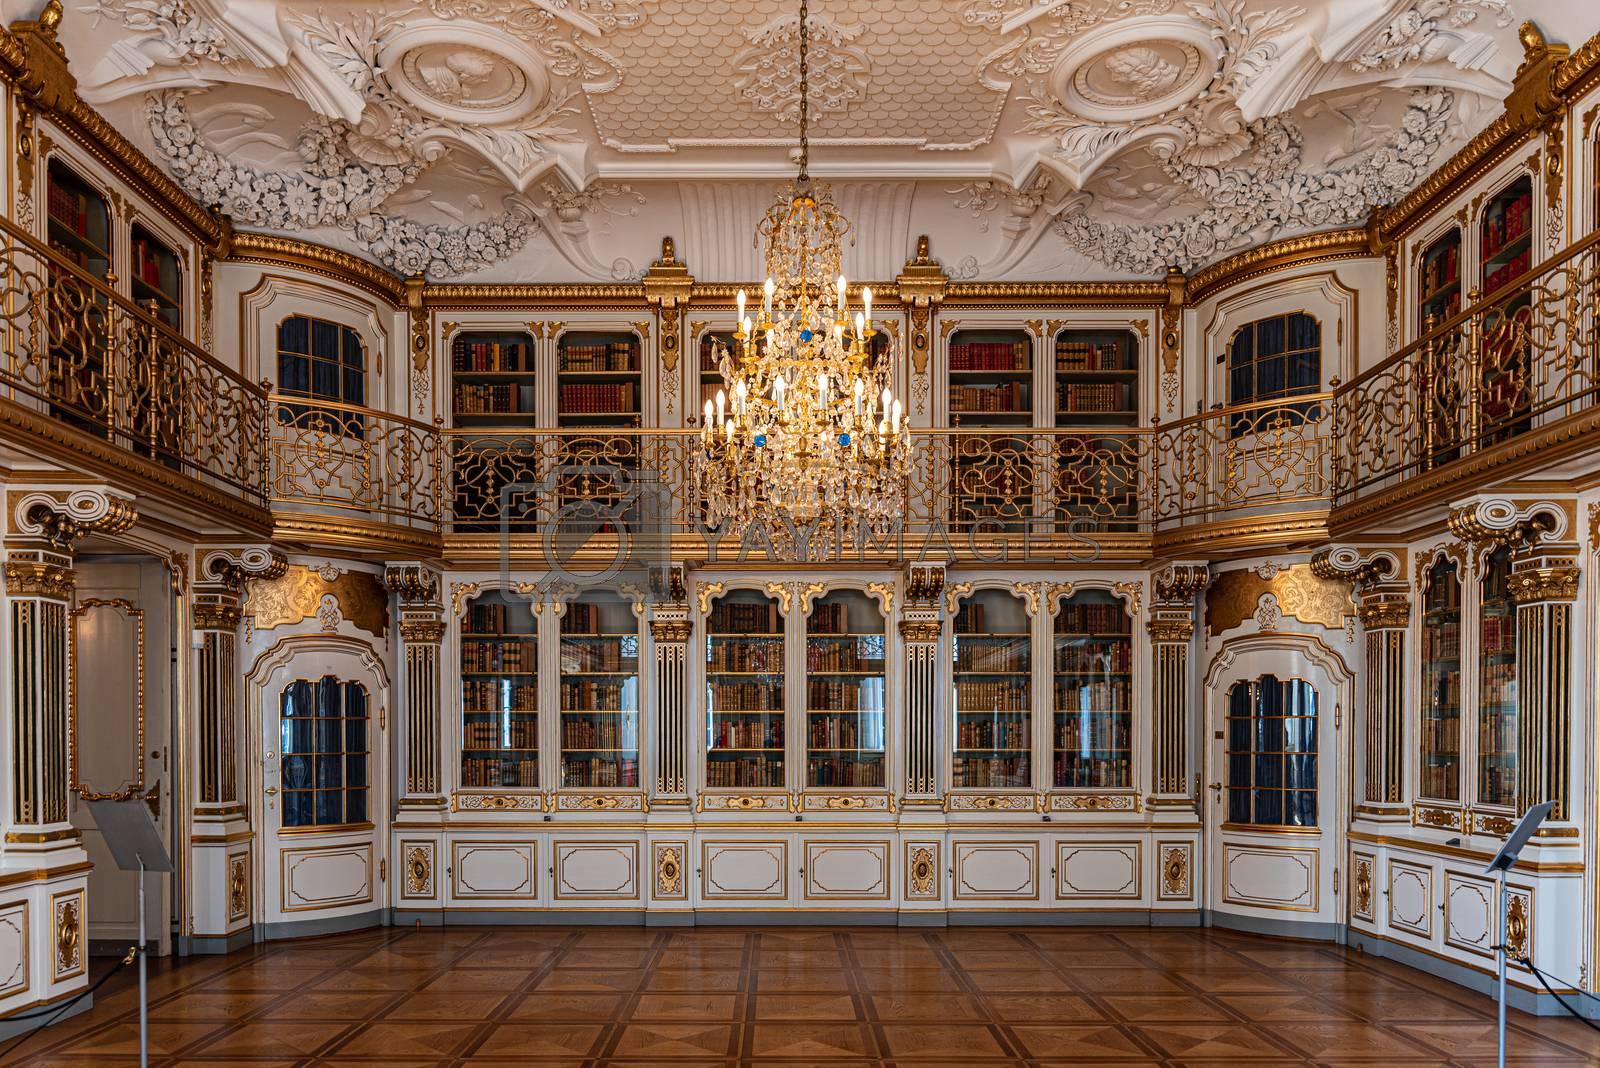 Interiors of royal halls in Christiansborg Palace in Copenhagen Denmark